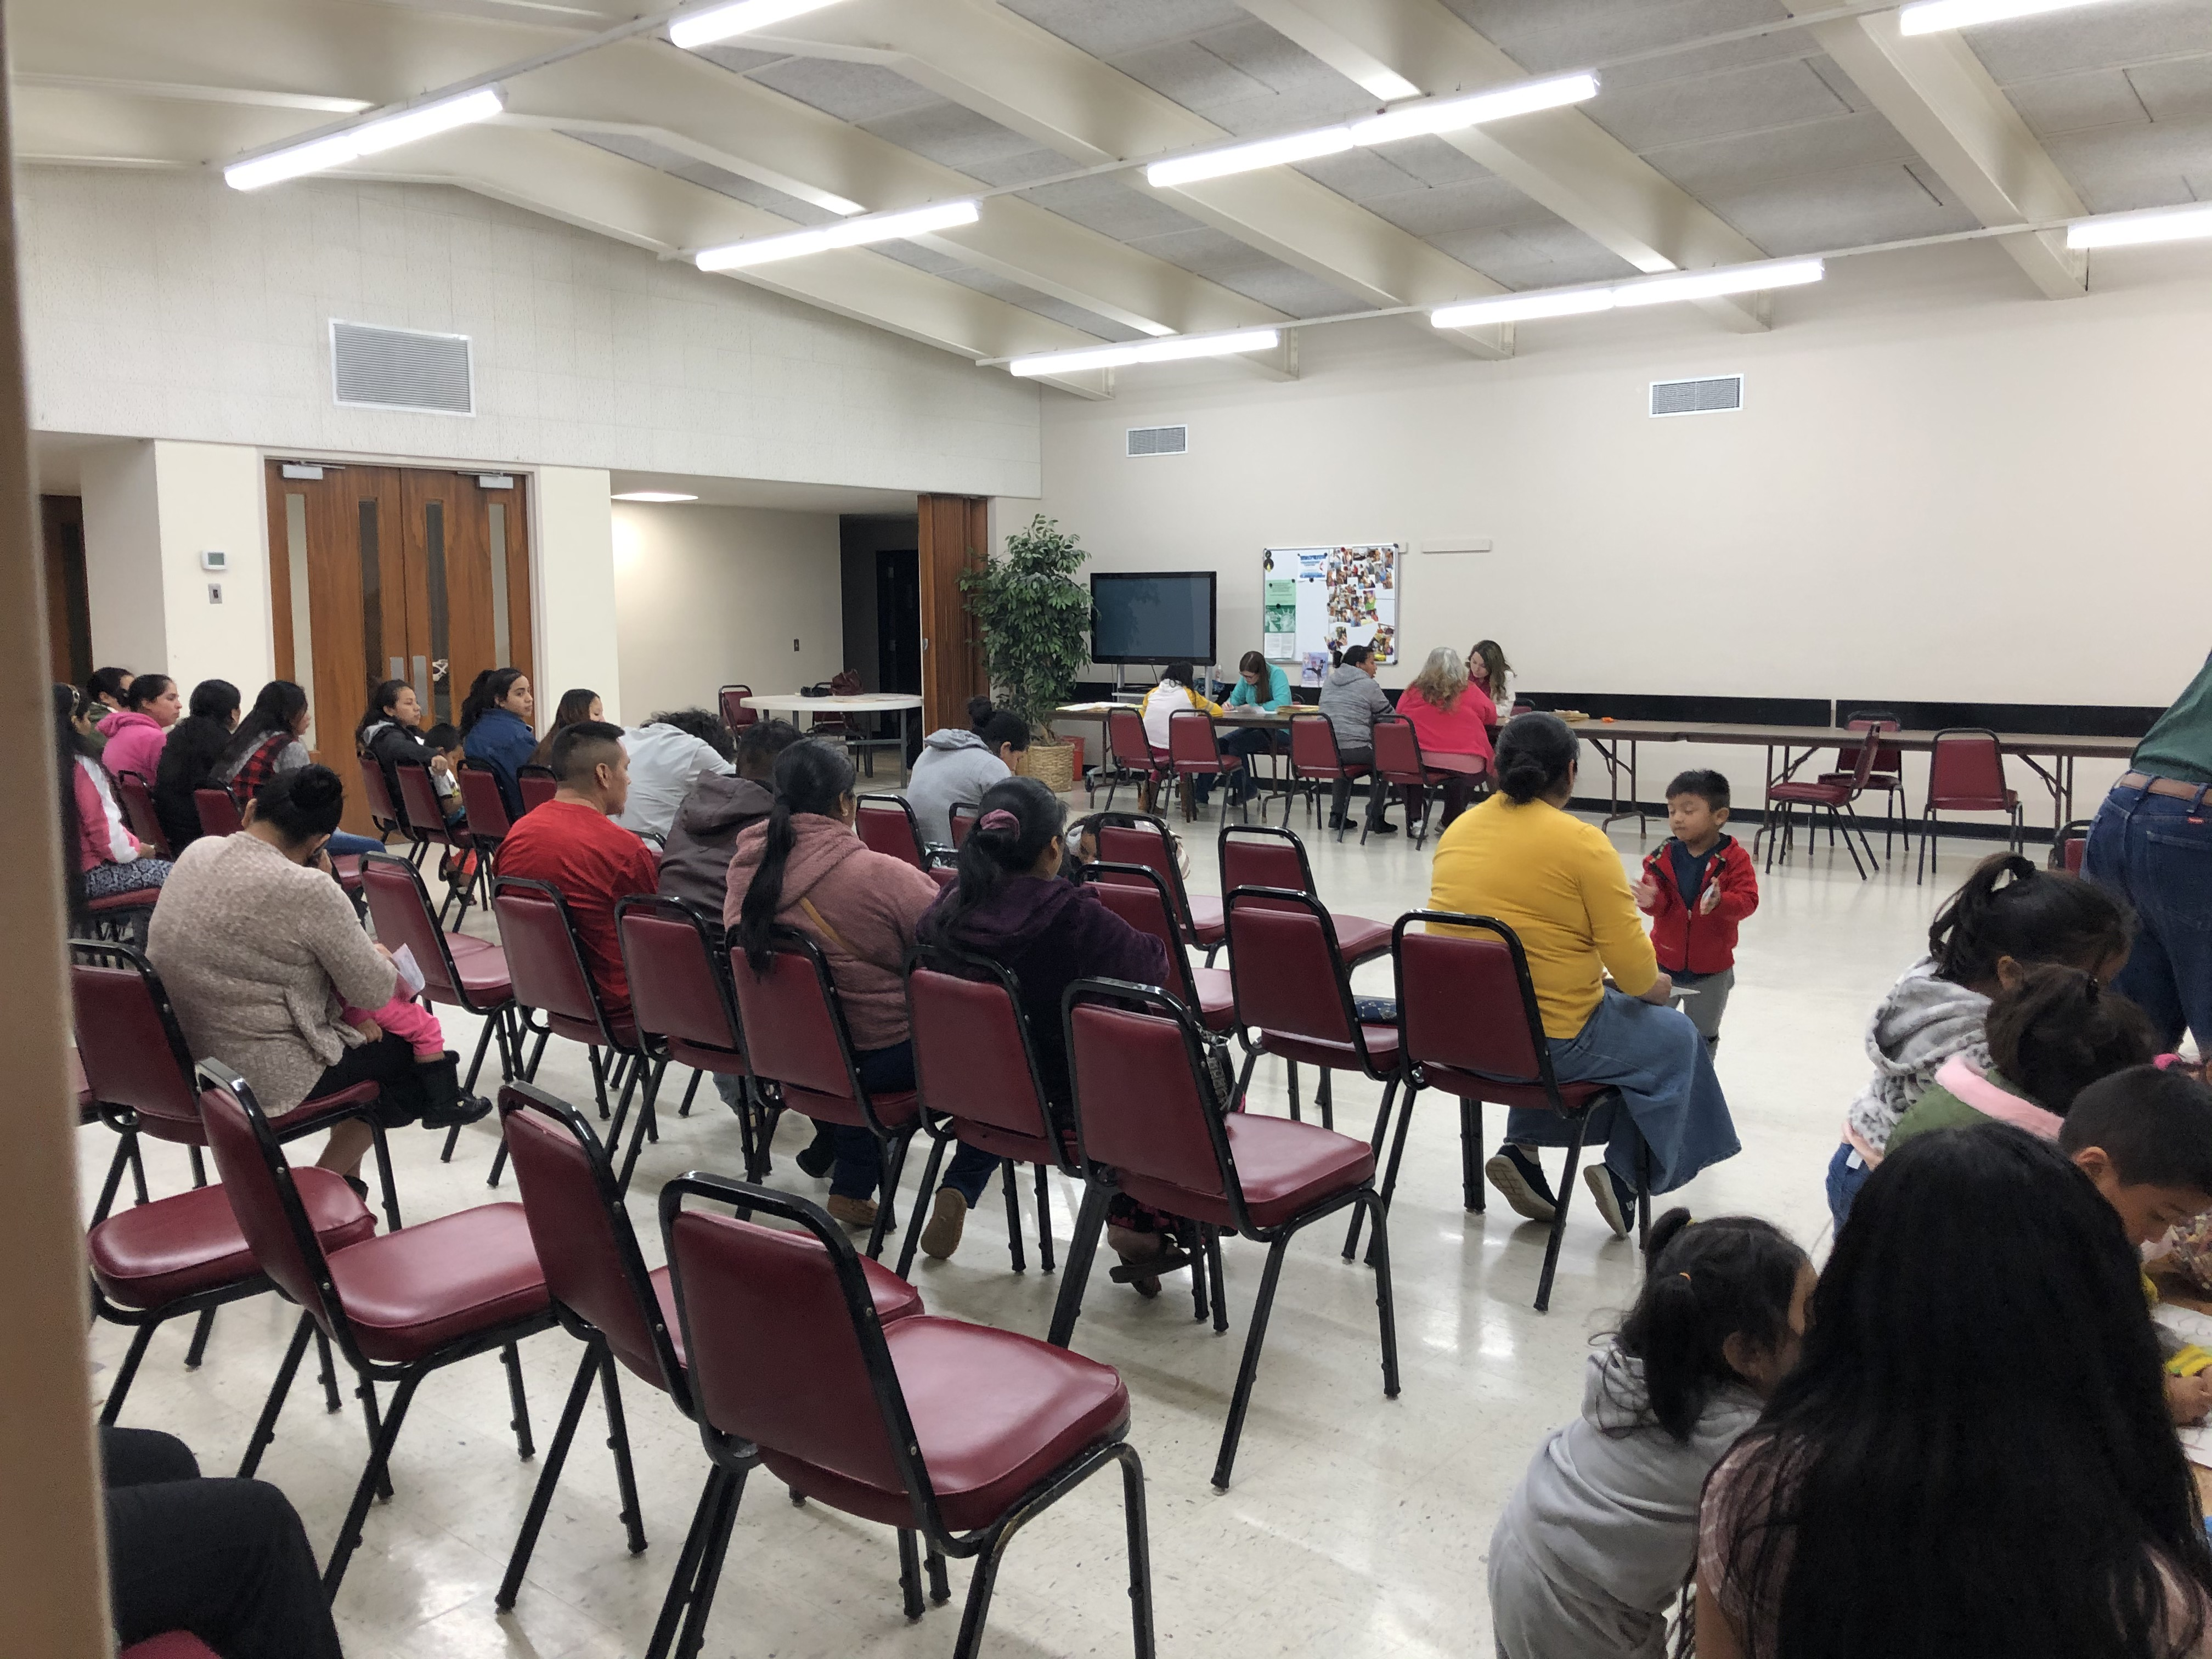 Image - Immigrants waiting area IMG_1056 (002).jpg